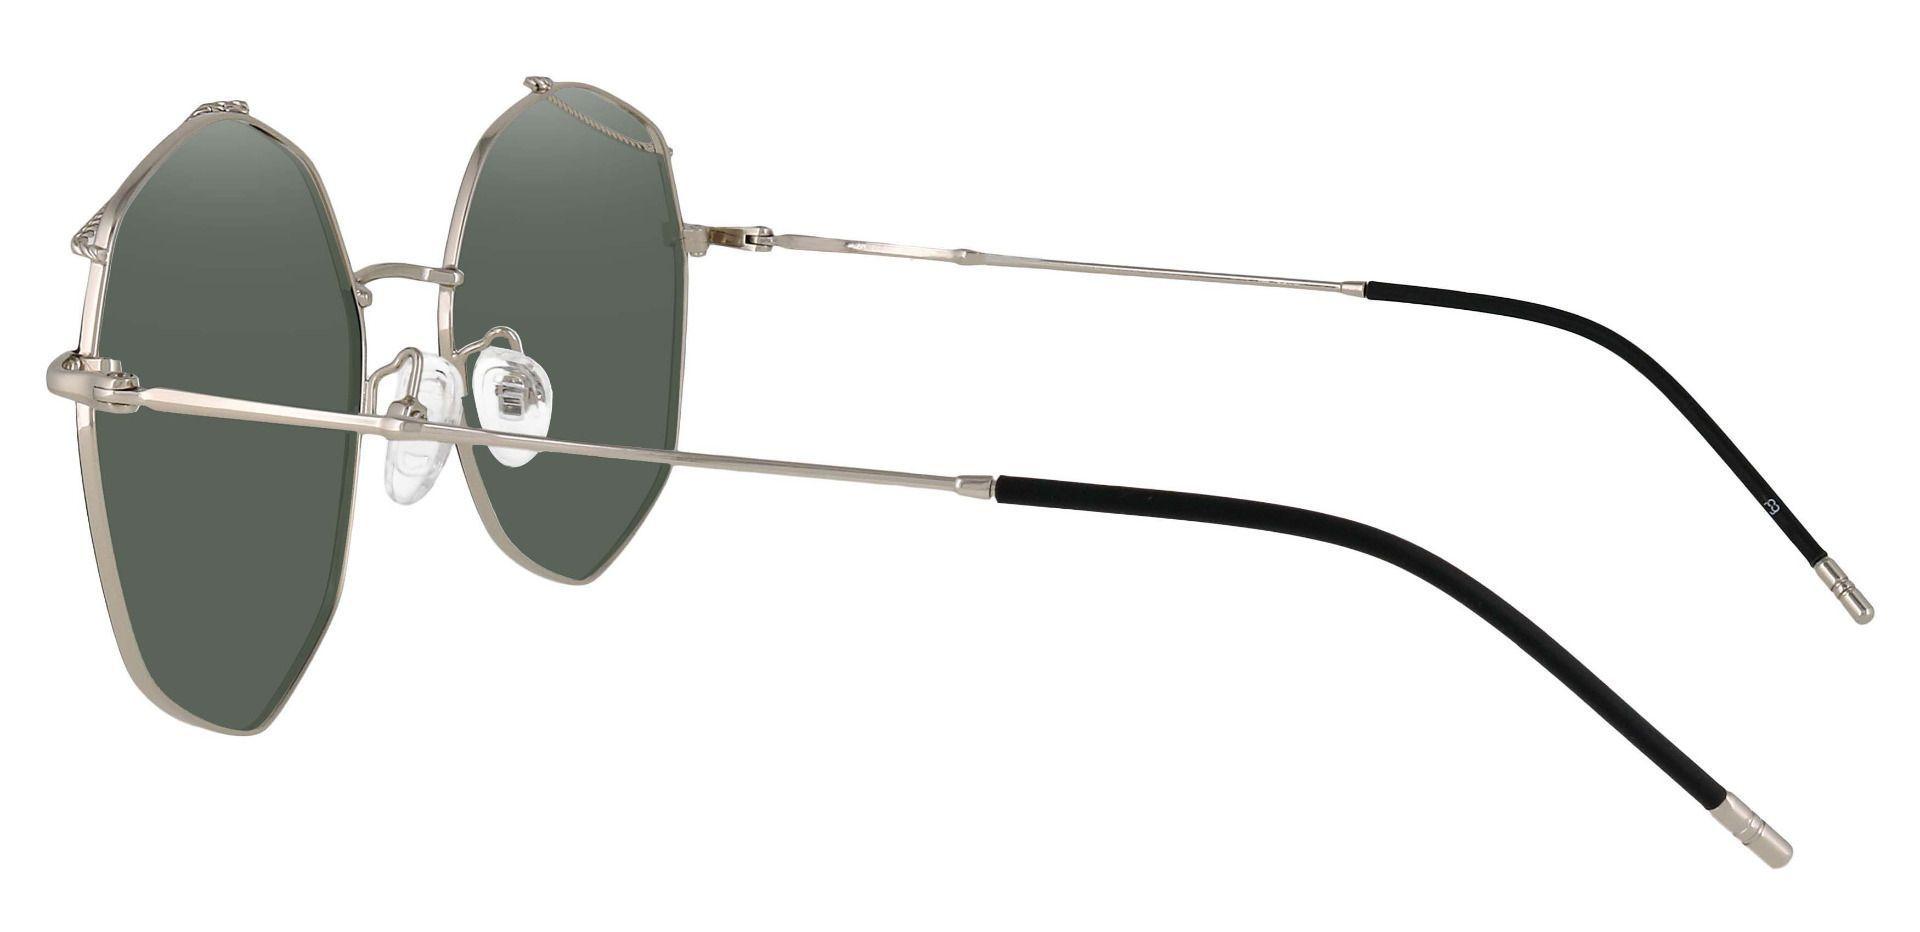 Tango Geometric Non-Rx Sunglasses - Black Frame With Green Lenses